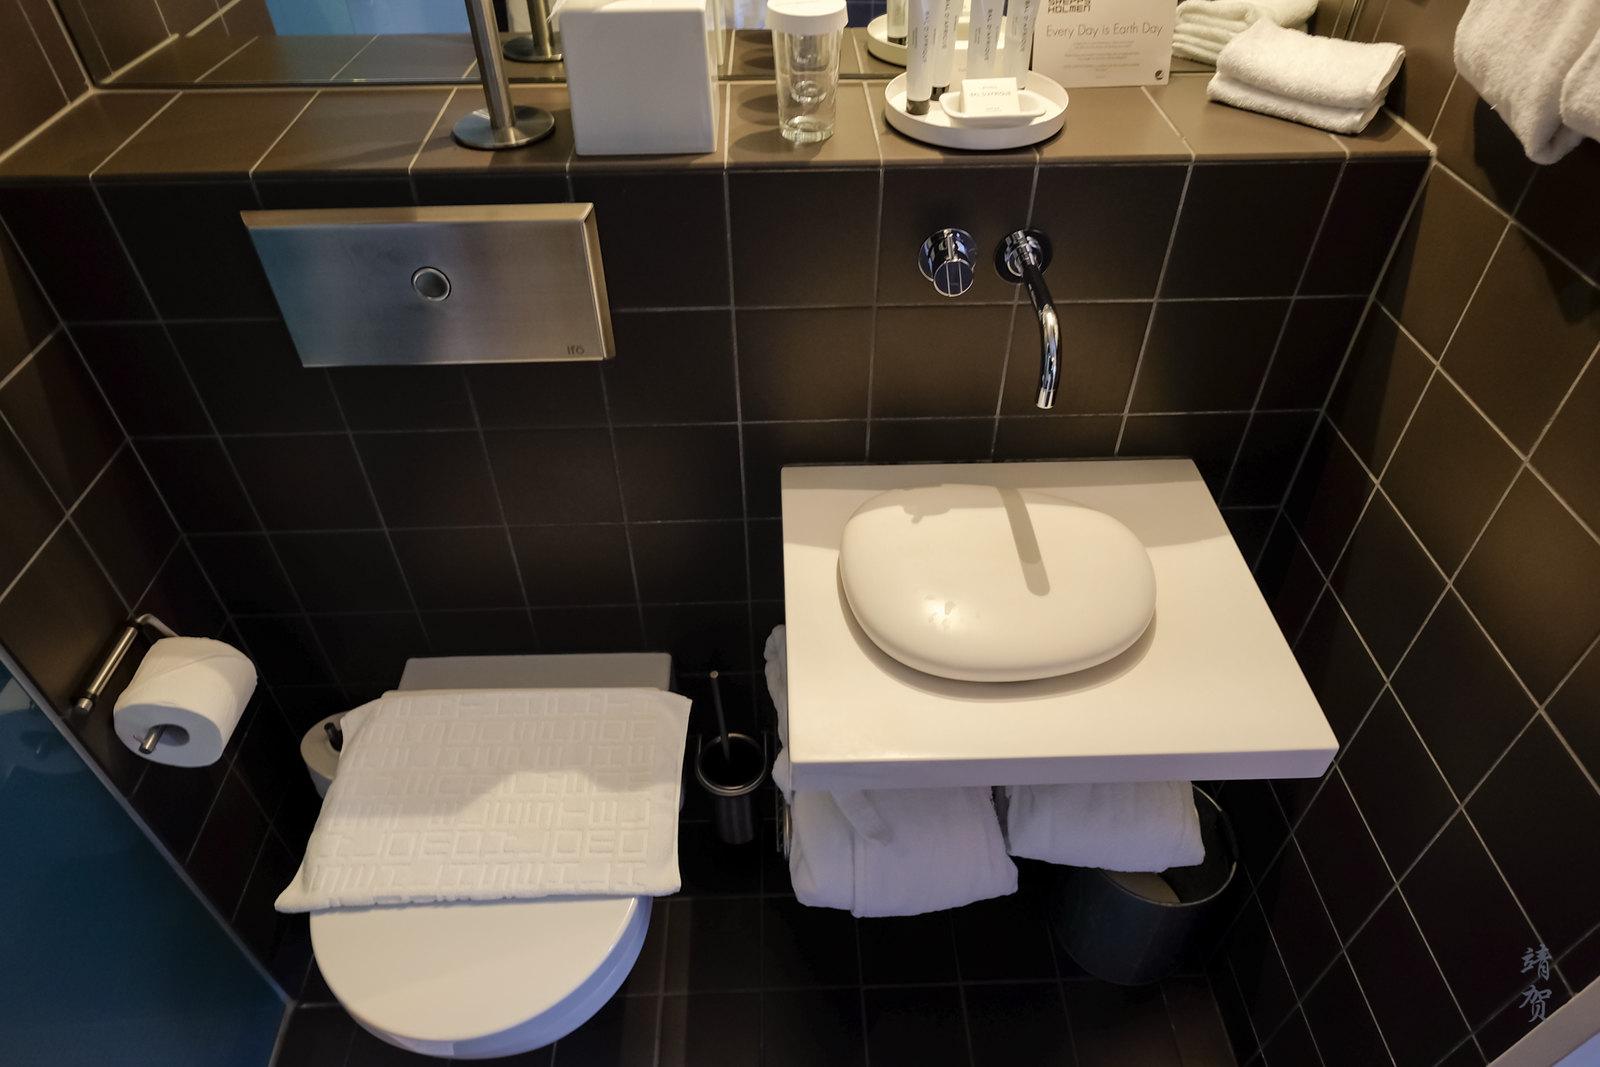 Unique sink and toilet